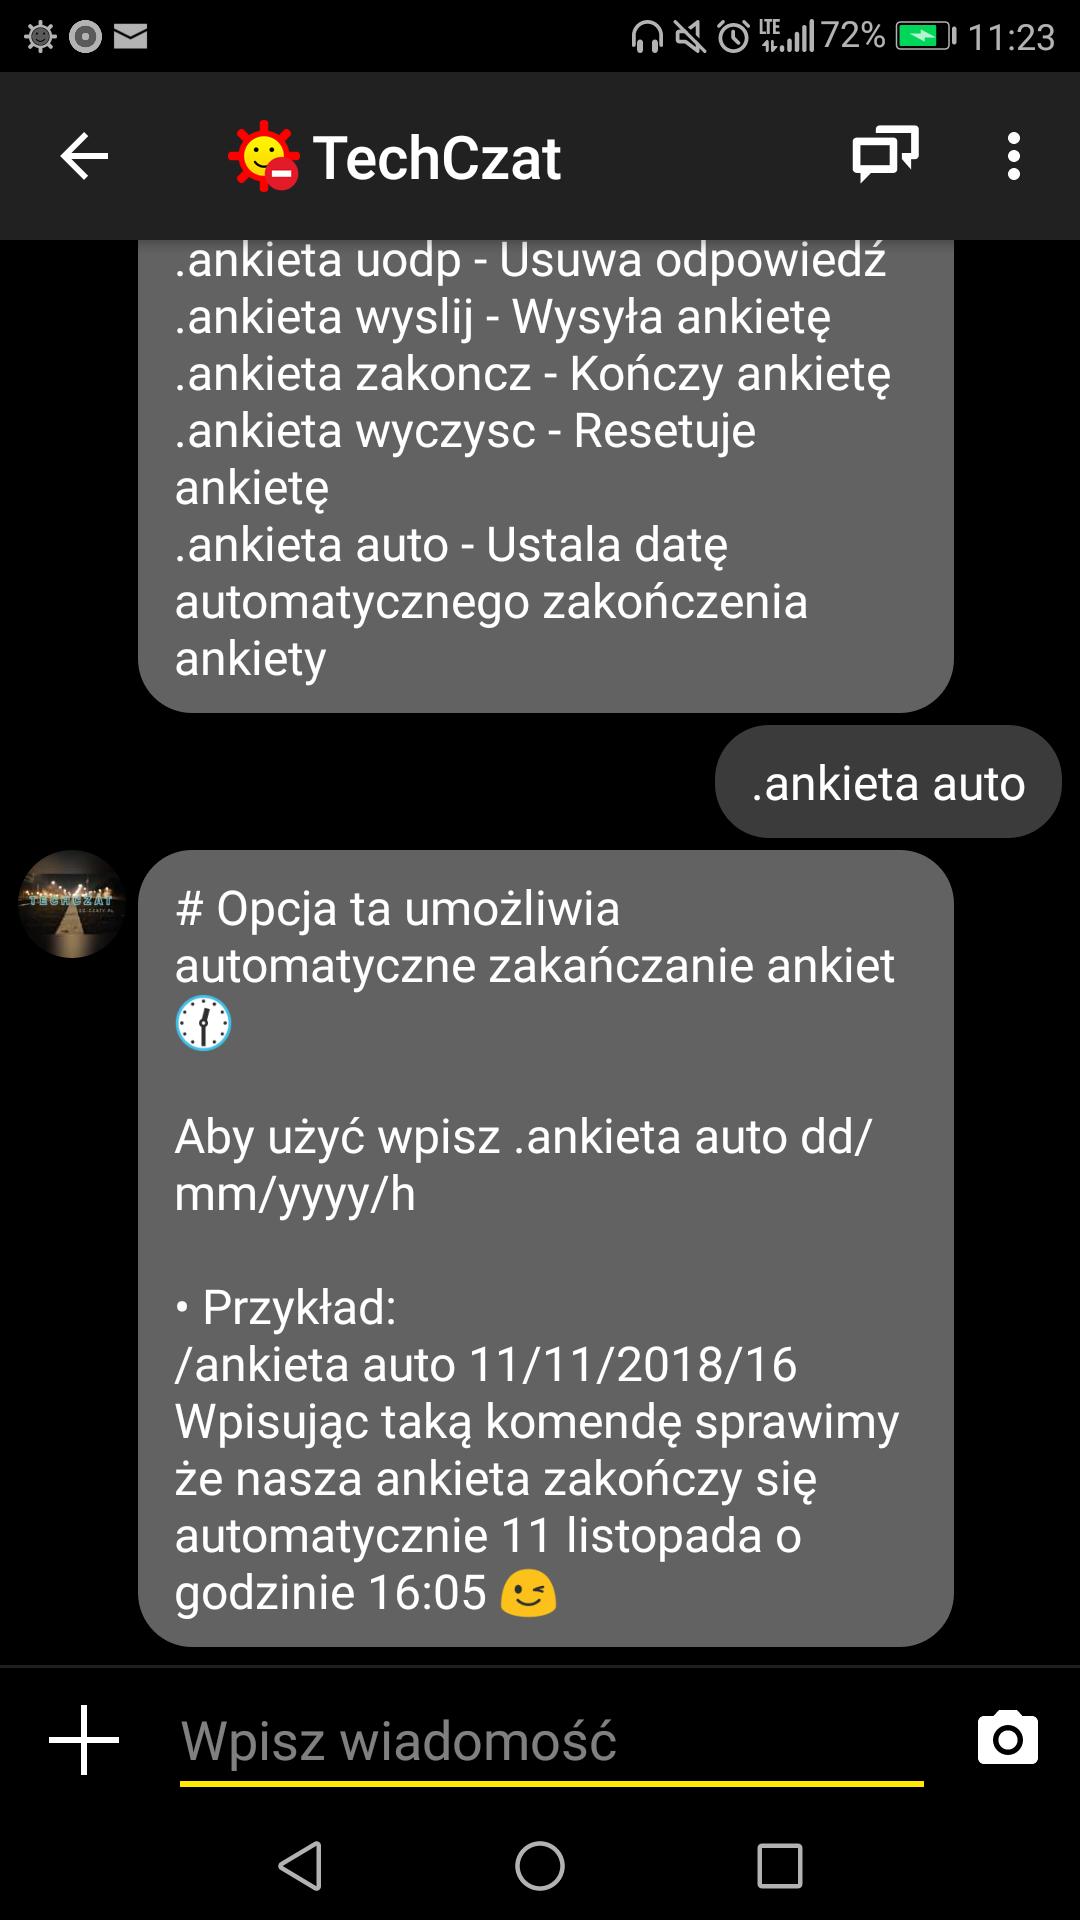 Screenshot_20181112-112354.png